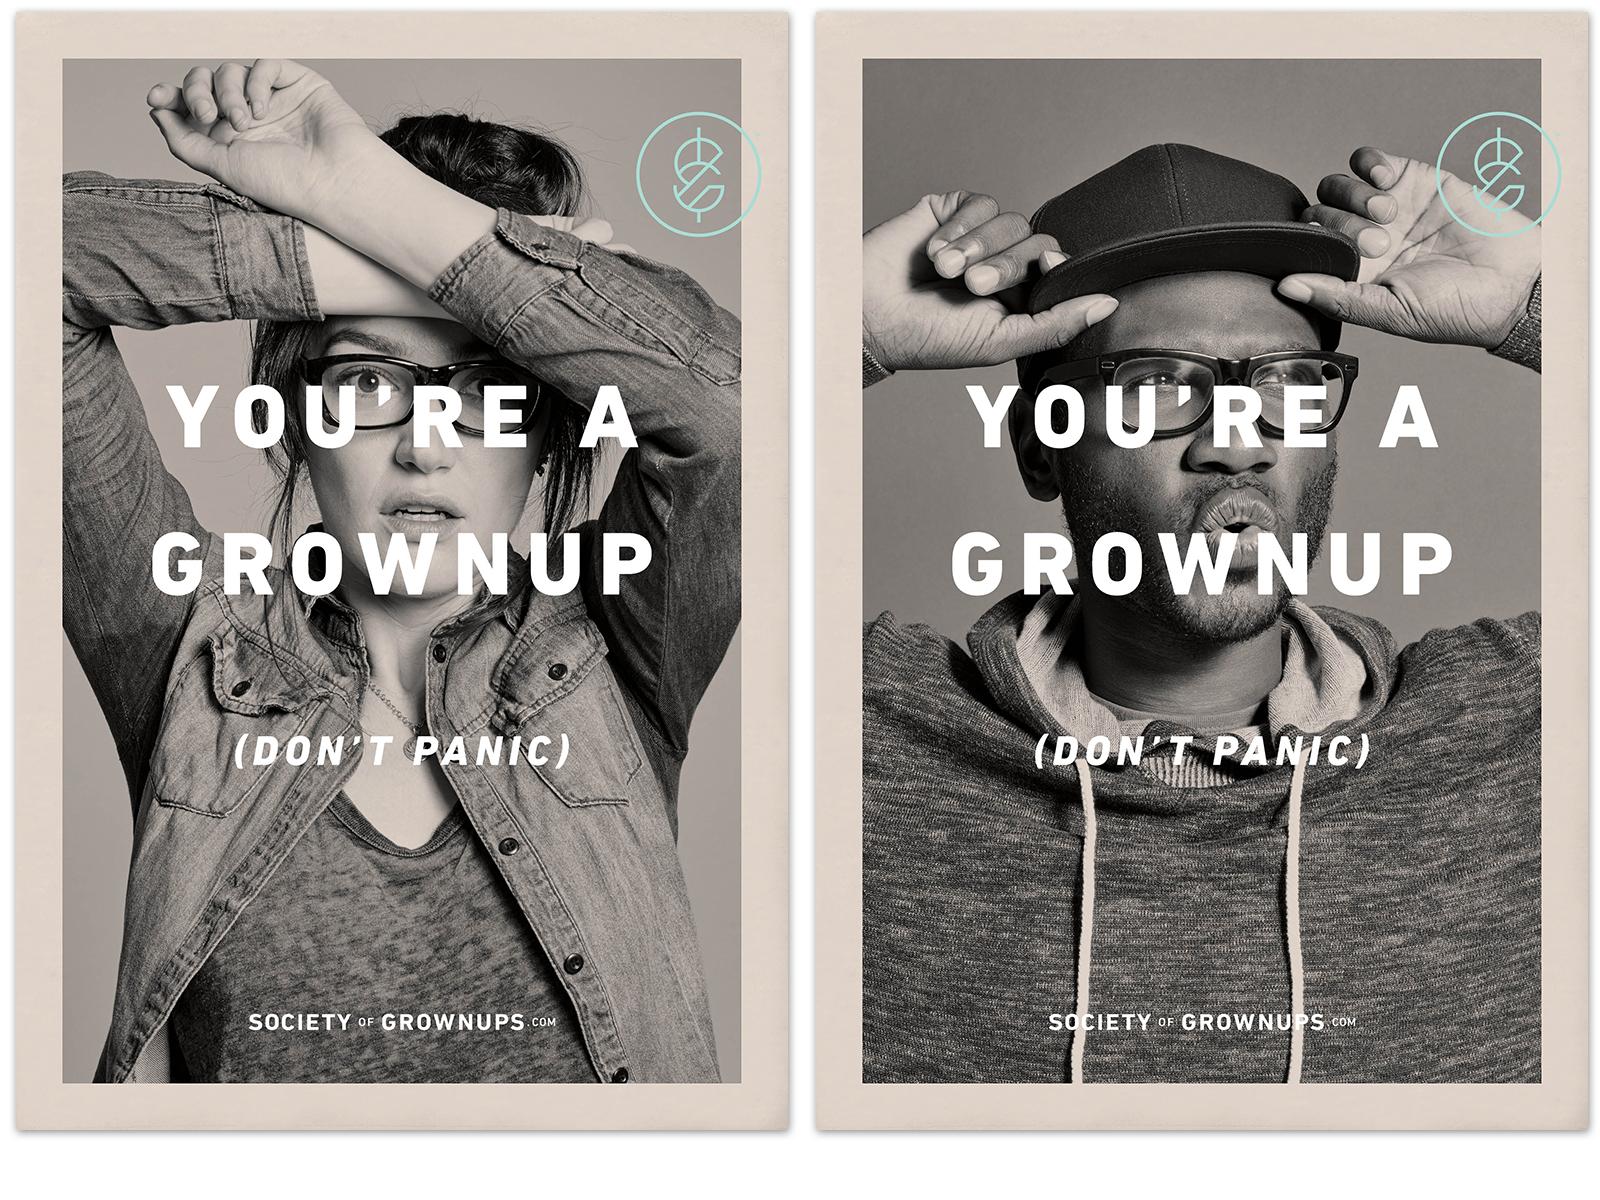 Society of Grownups Advertising